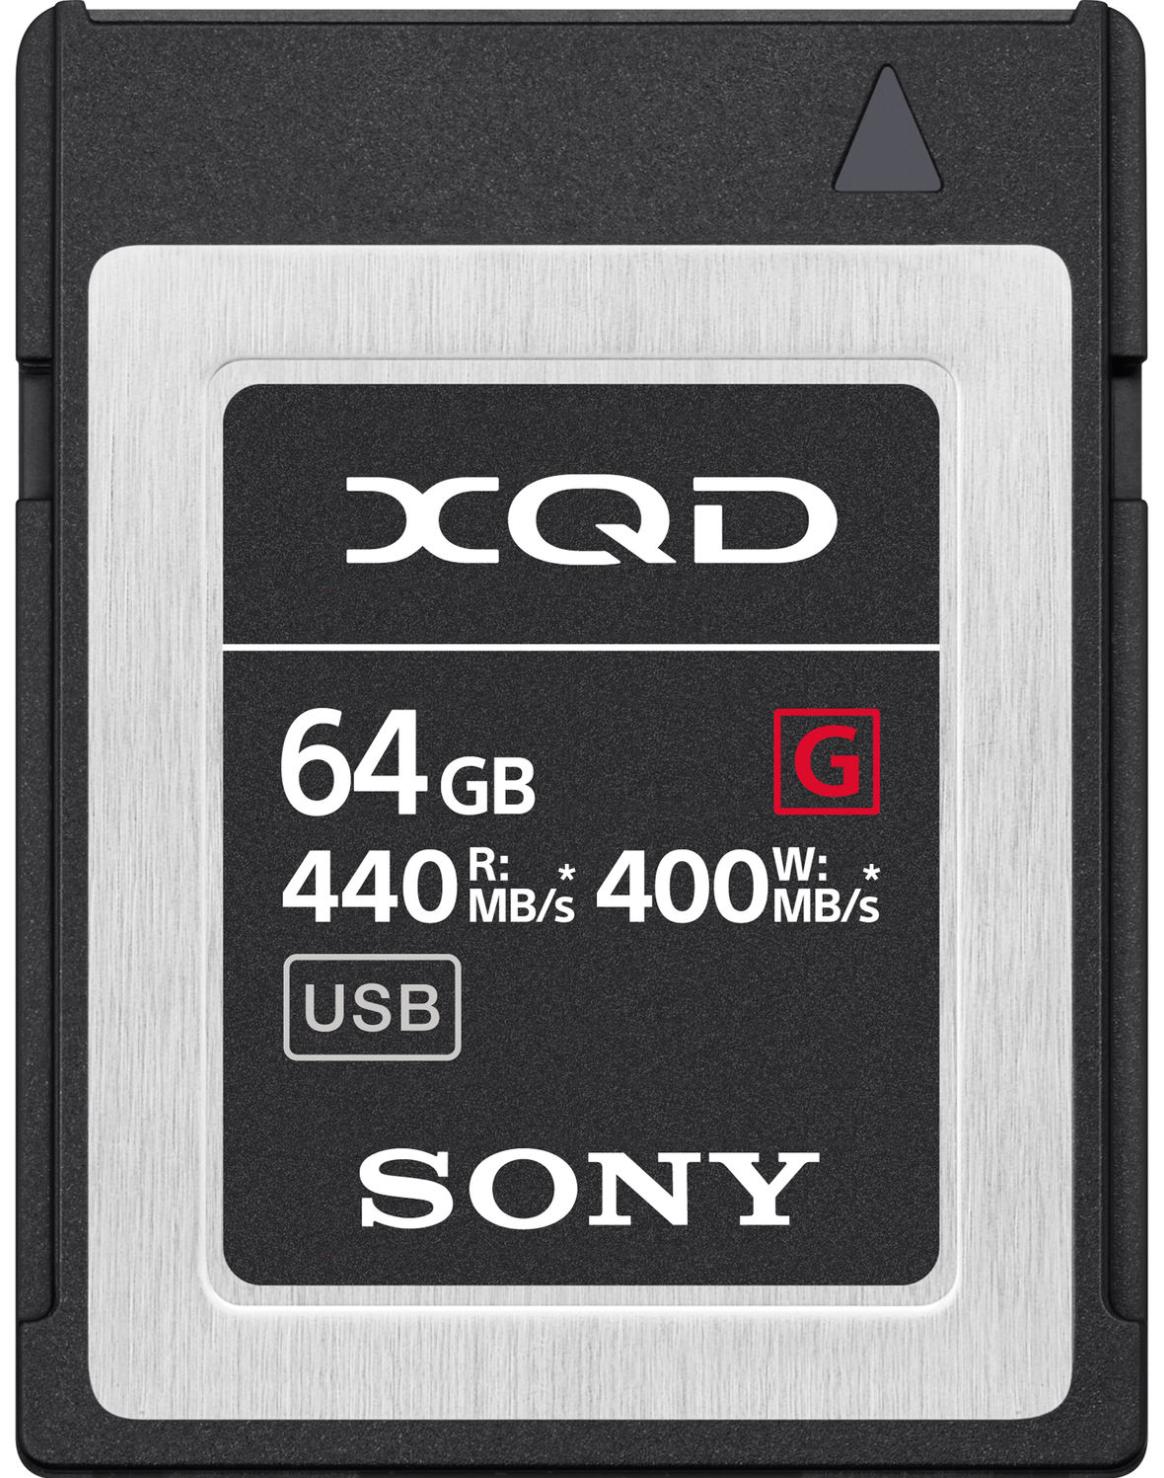 Sony 64GB XQD-G64F/J 440mb/s (Write 400mb/s)